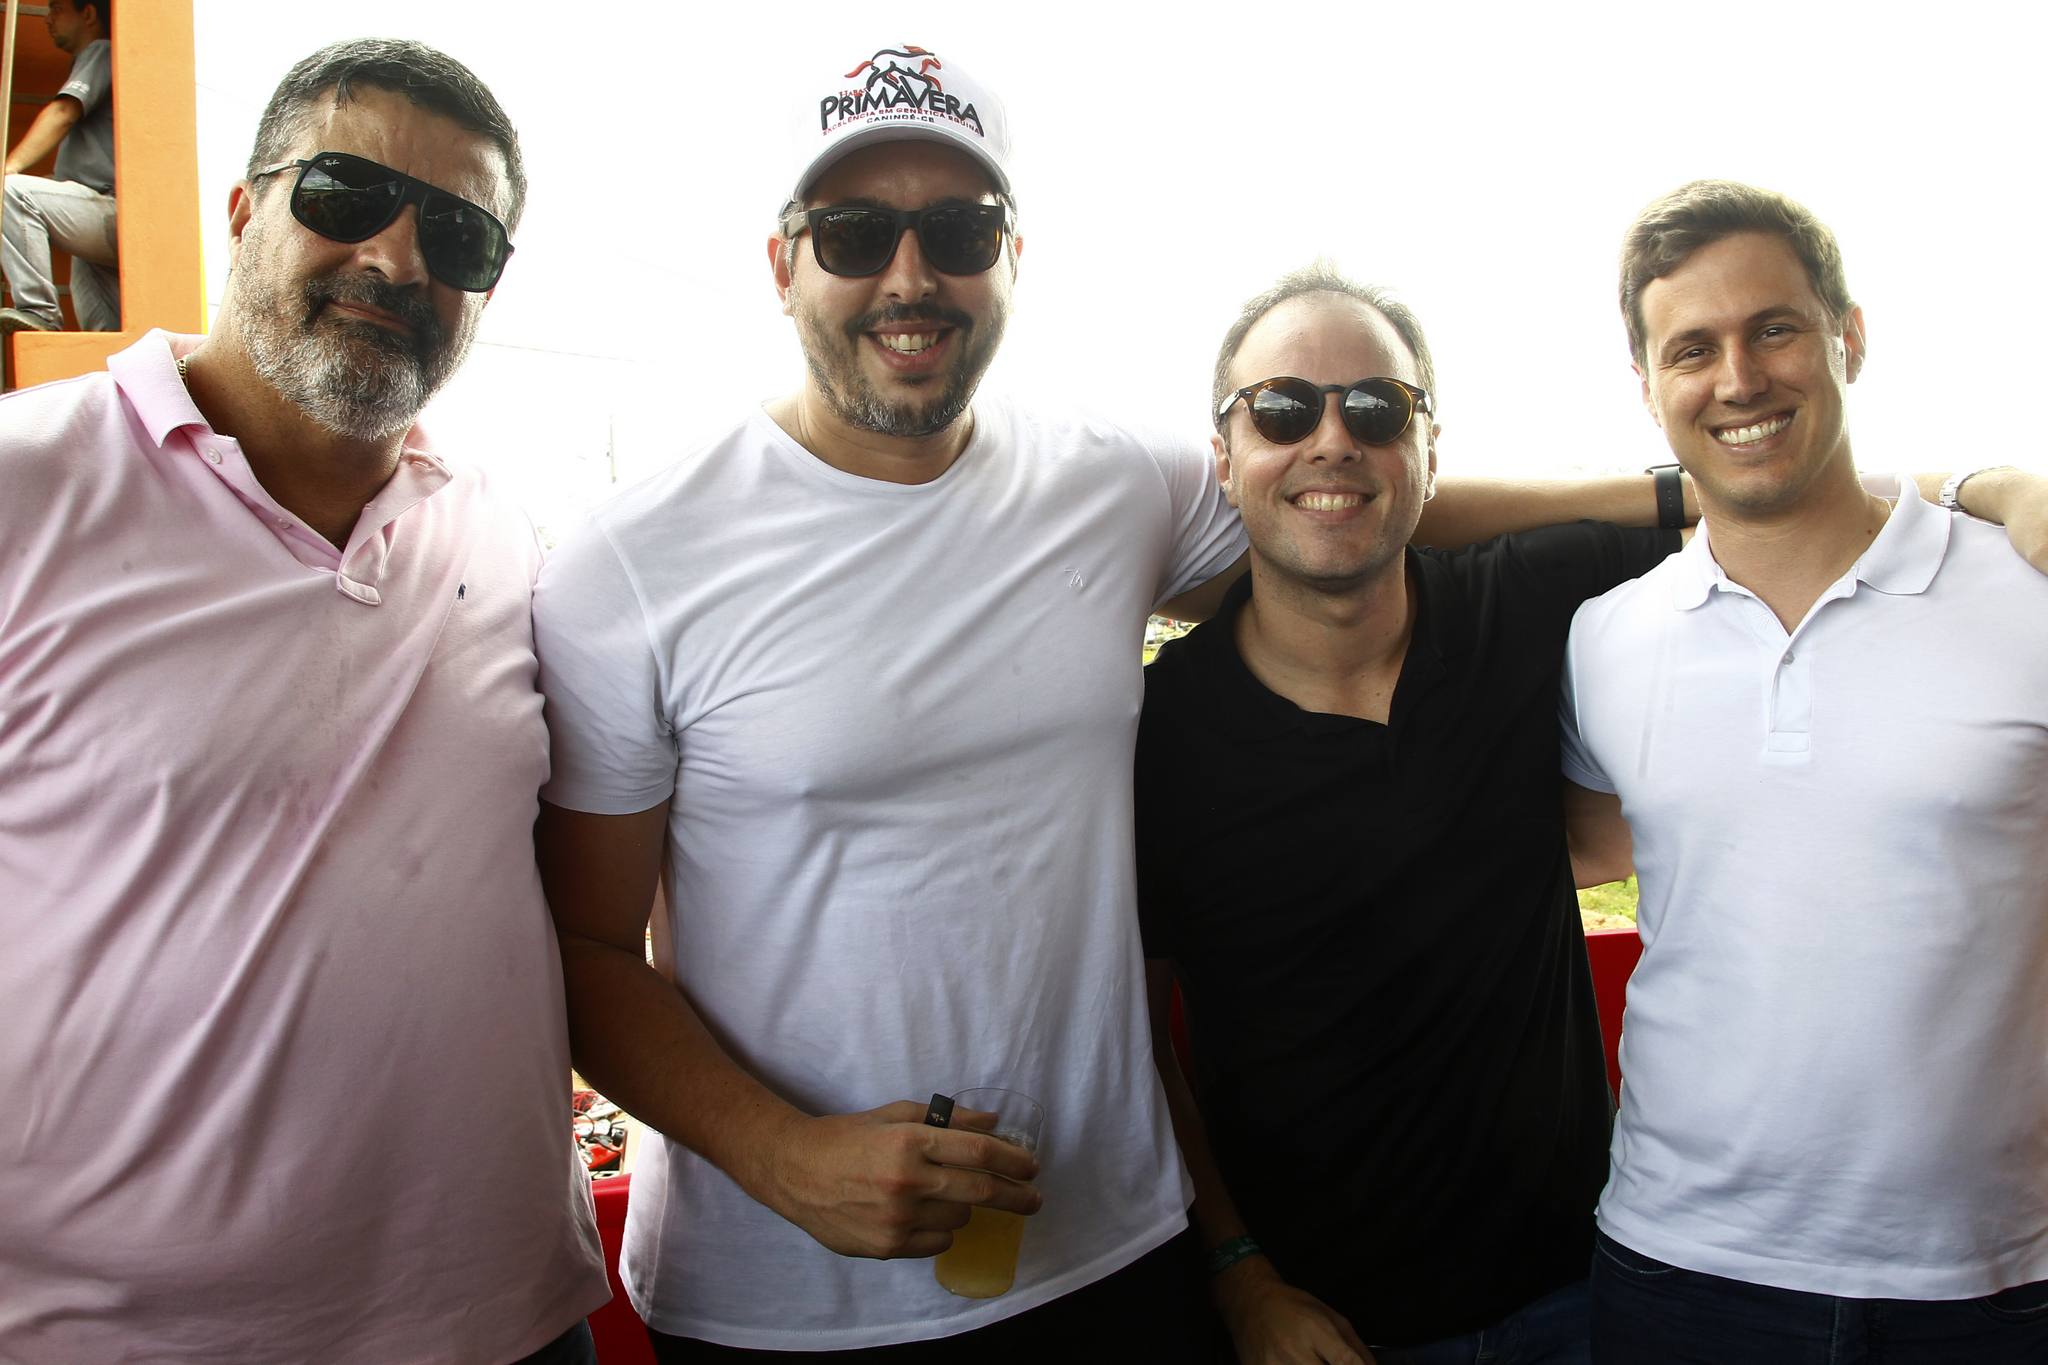 Paulo Costa, Tiago Leal, Daniel Aragao E Thiago Aguiar